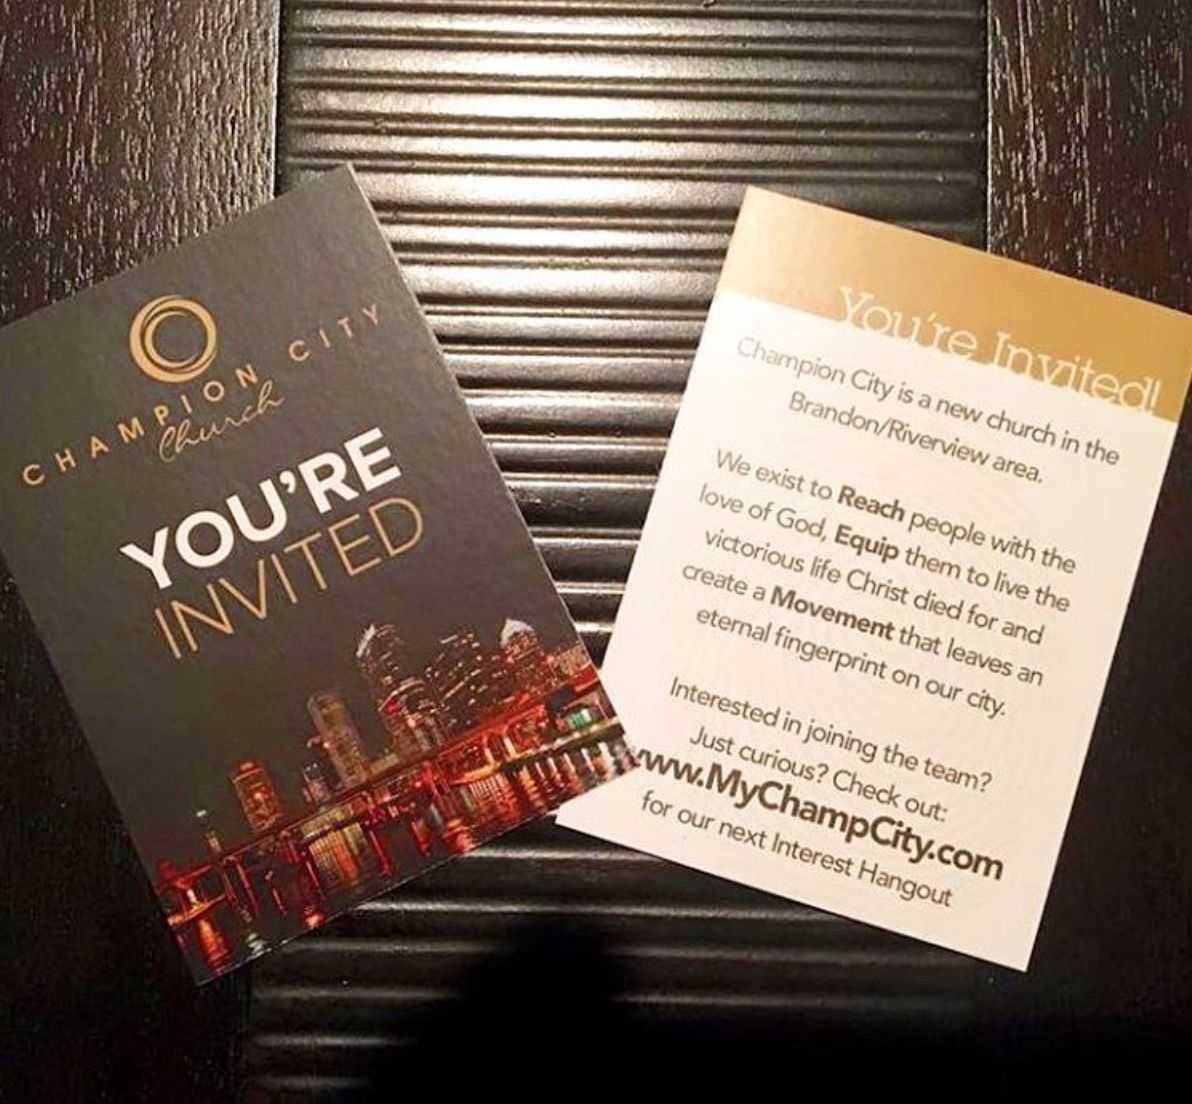 Invitation Cards | Outreach & Evangelism | Invitations Inside Church Invite Cards Template